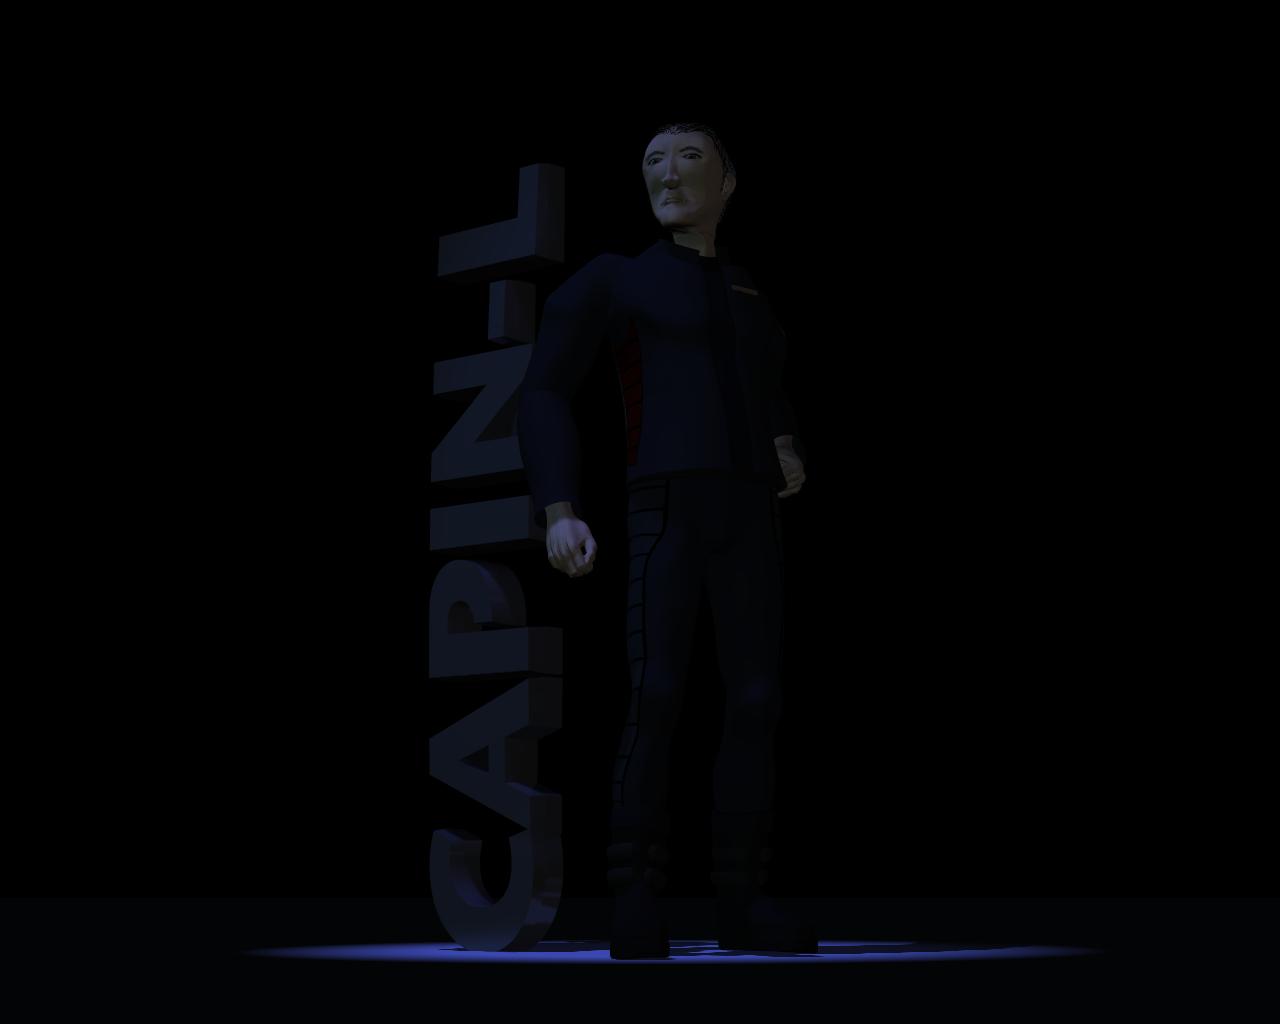 Promo Image #2: Capin-L Capinl10